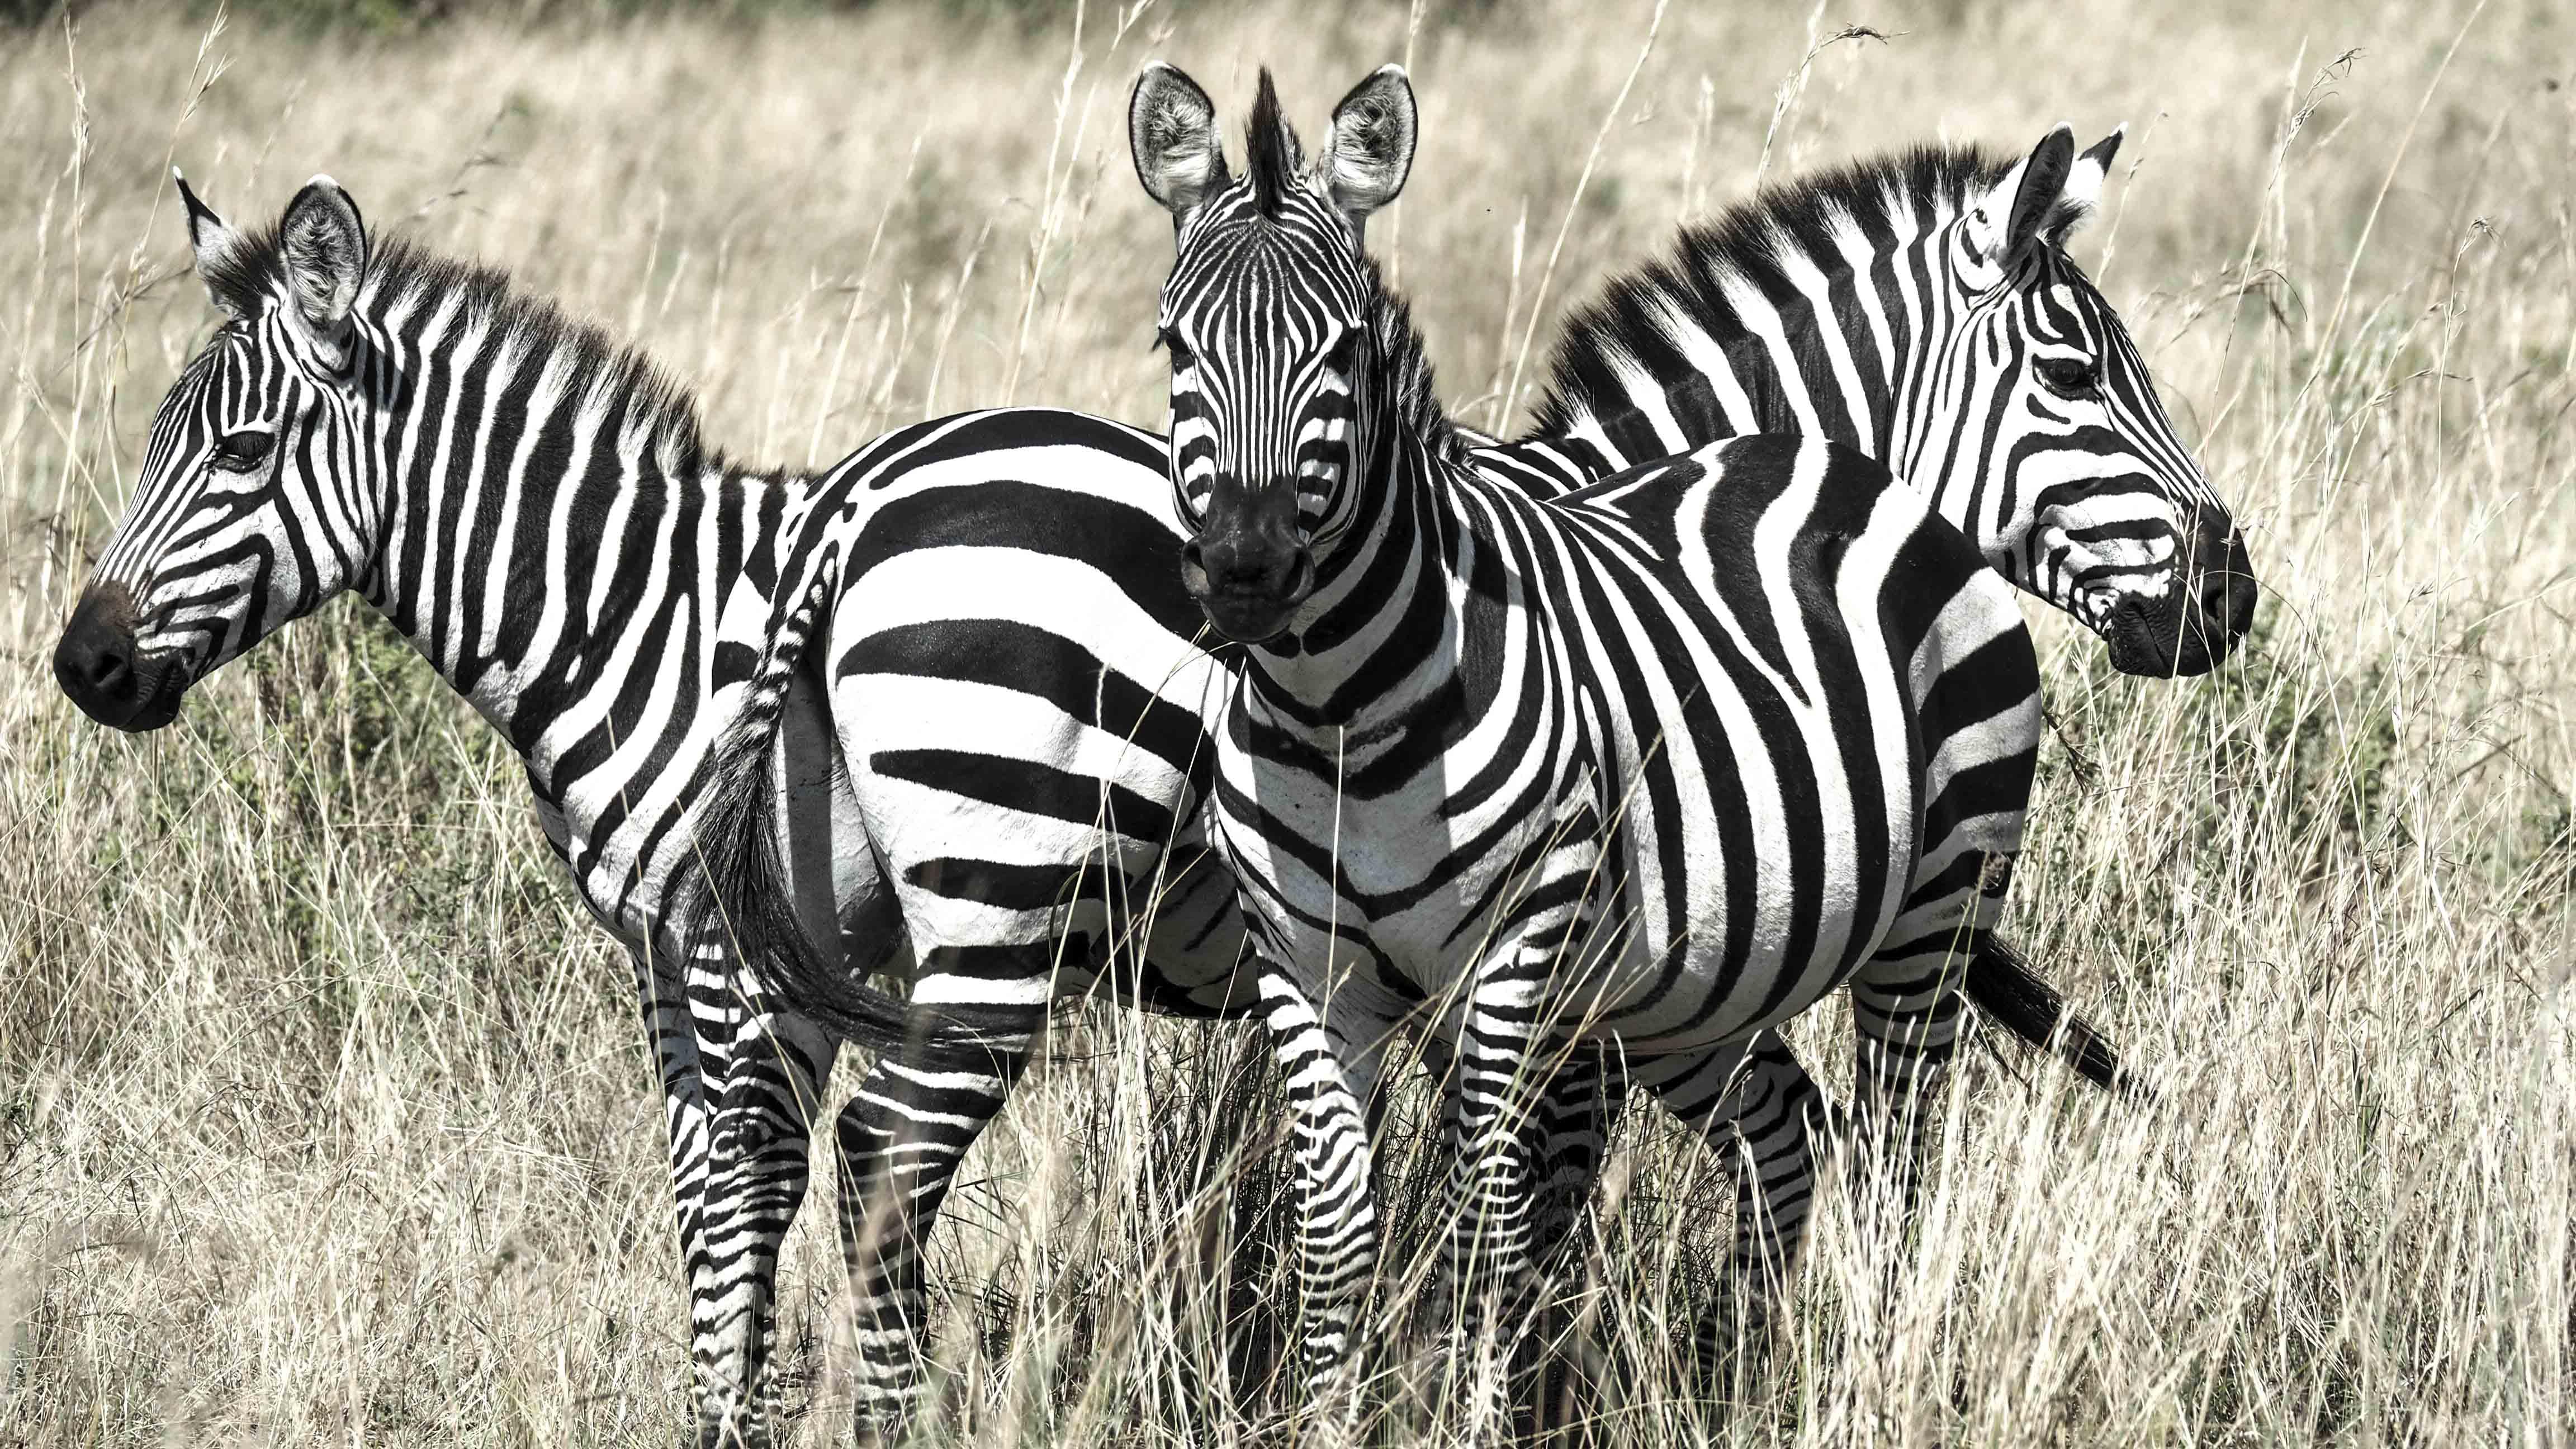 Zebras on guard